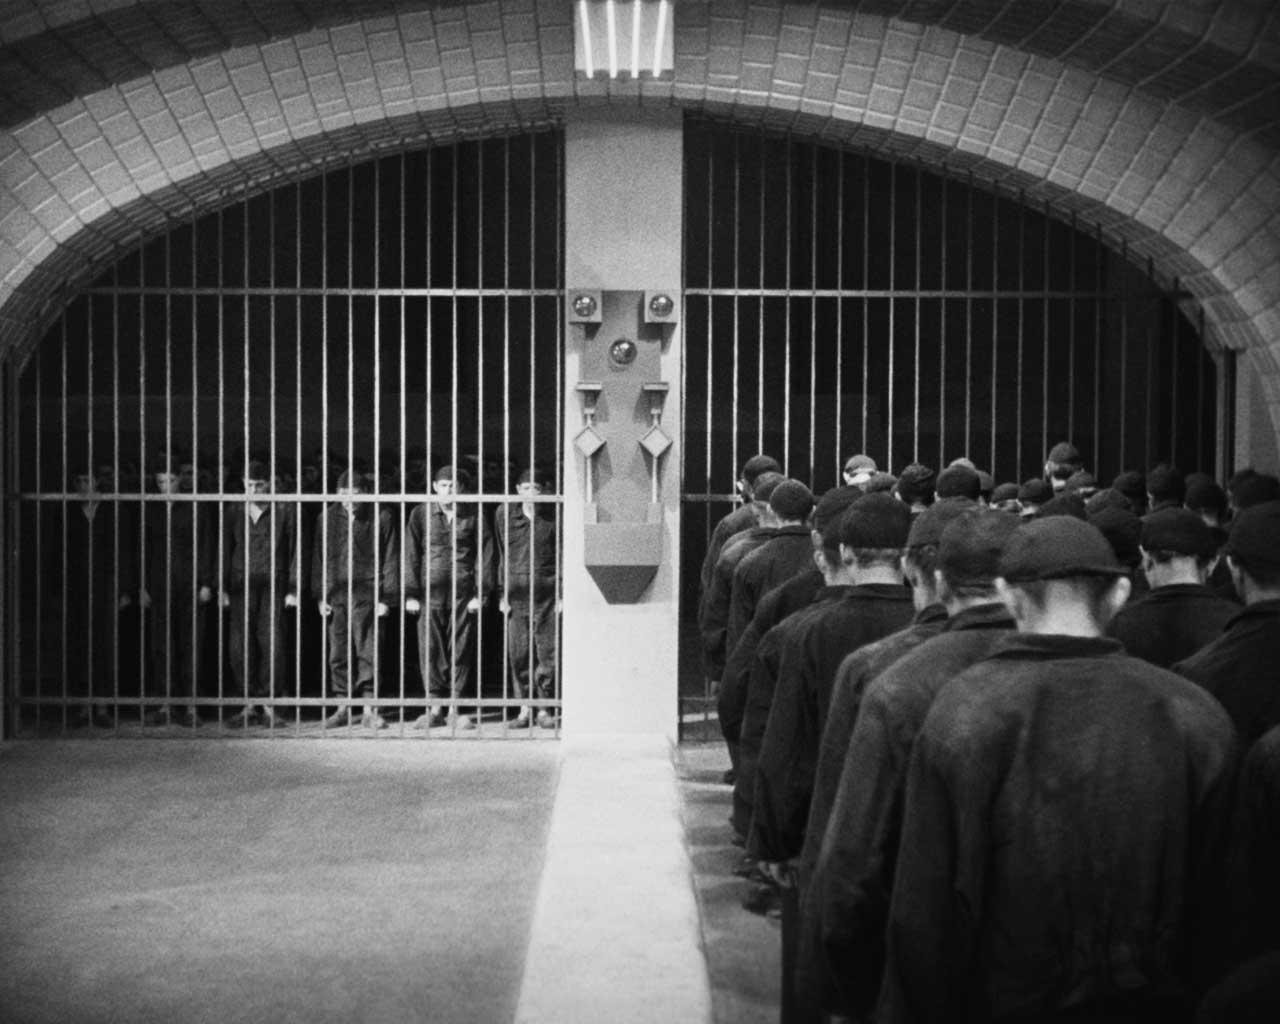 Metropolis, Director: Fritz Lang, 1927